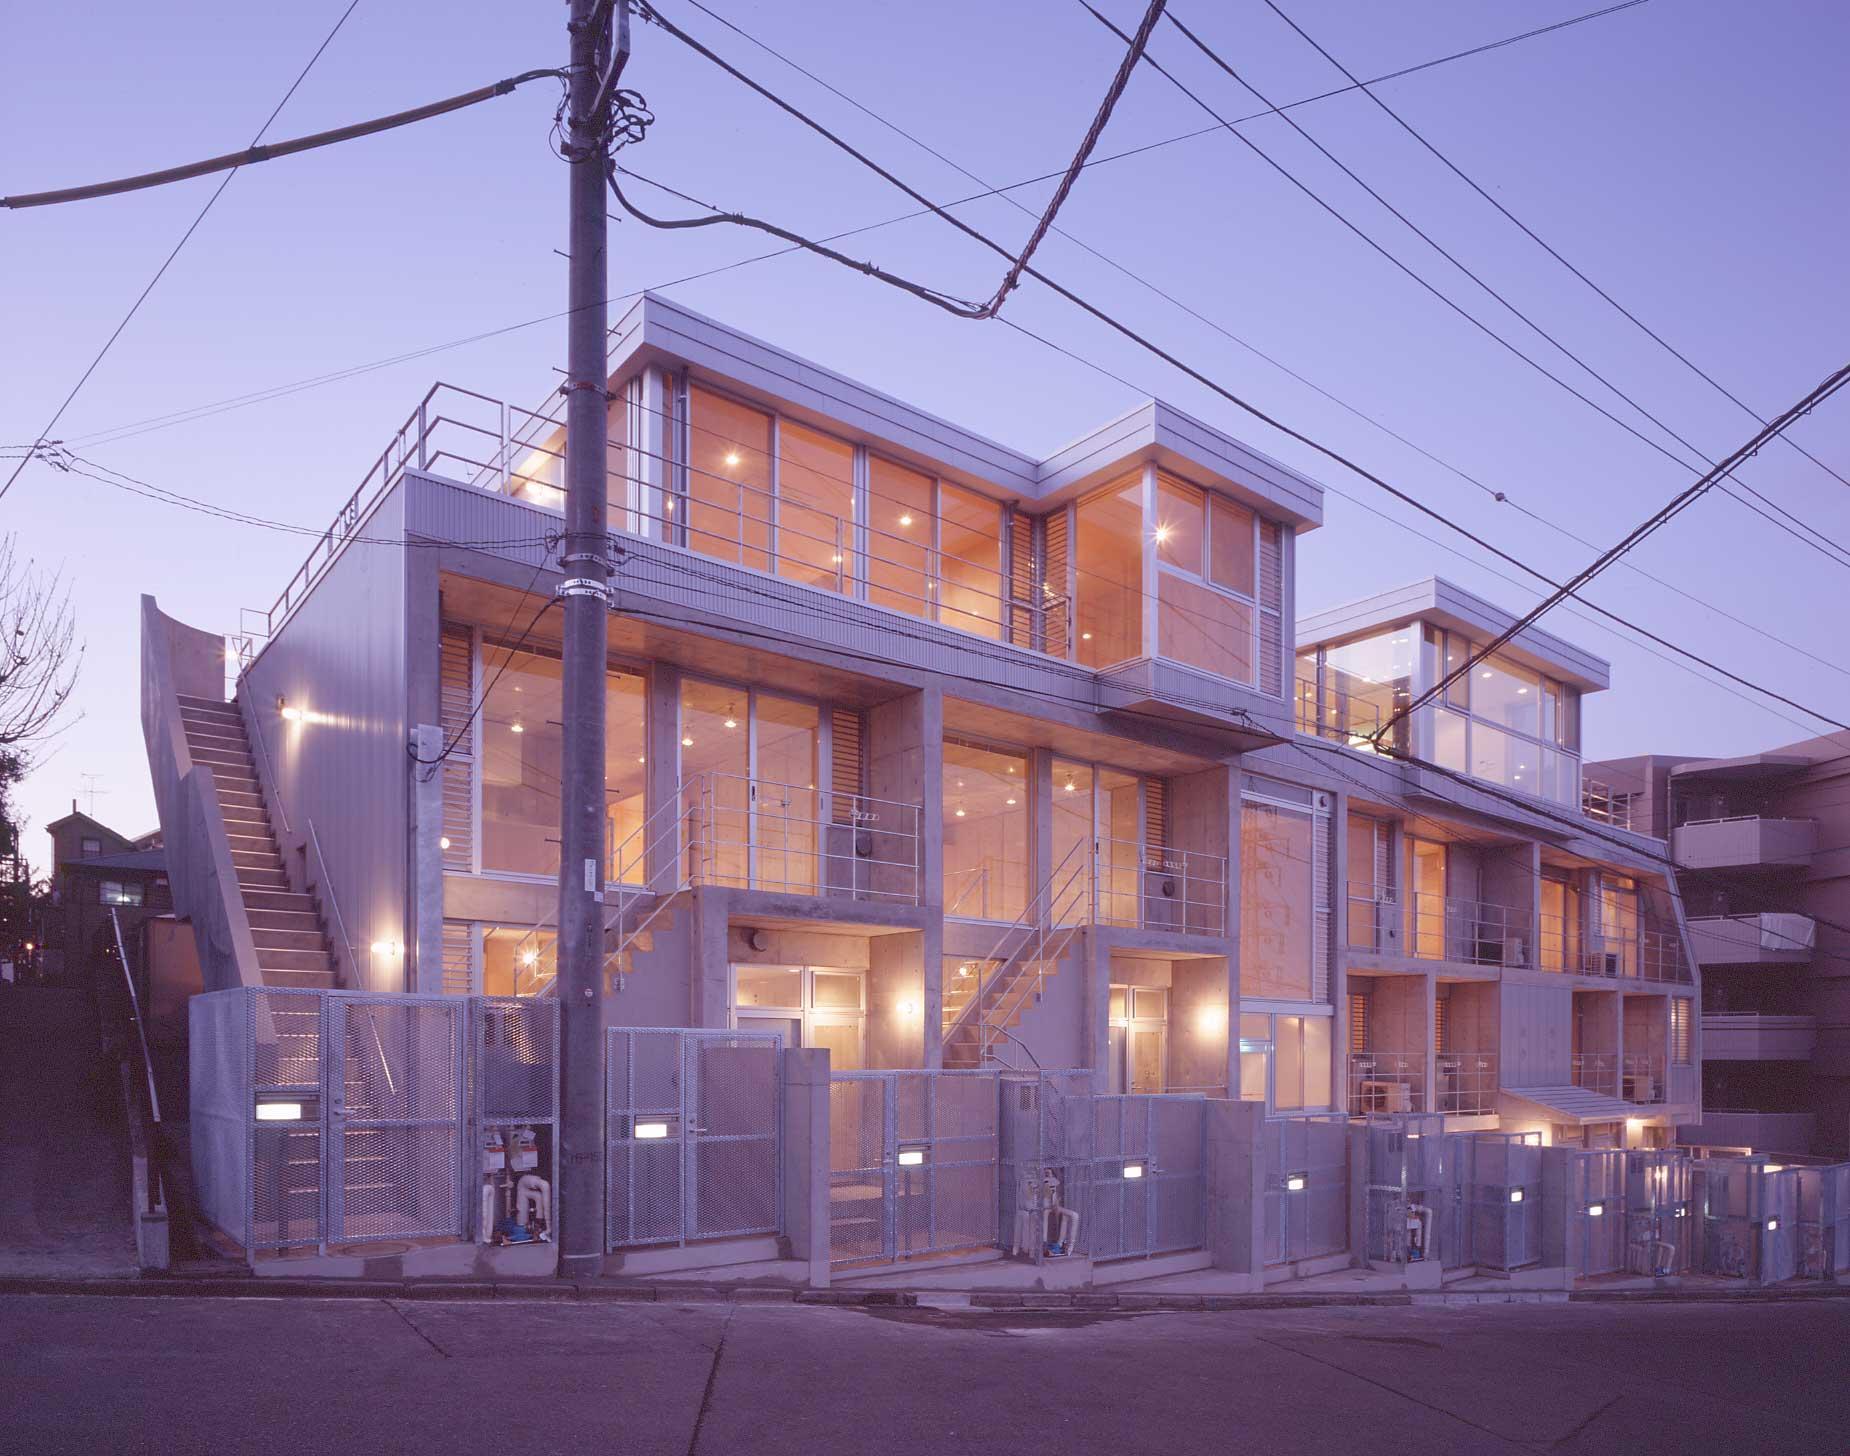 cabinaの部屋 マンション外観(撮影:Satoshi Asakawa)